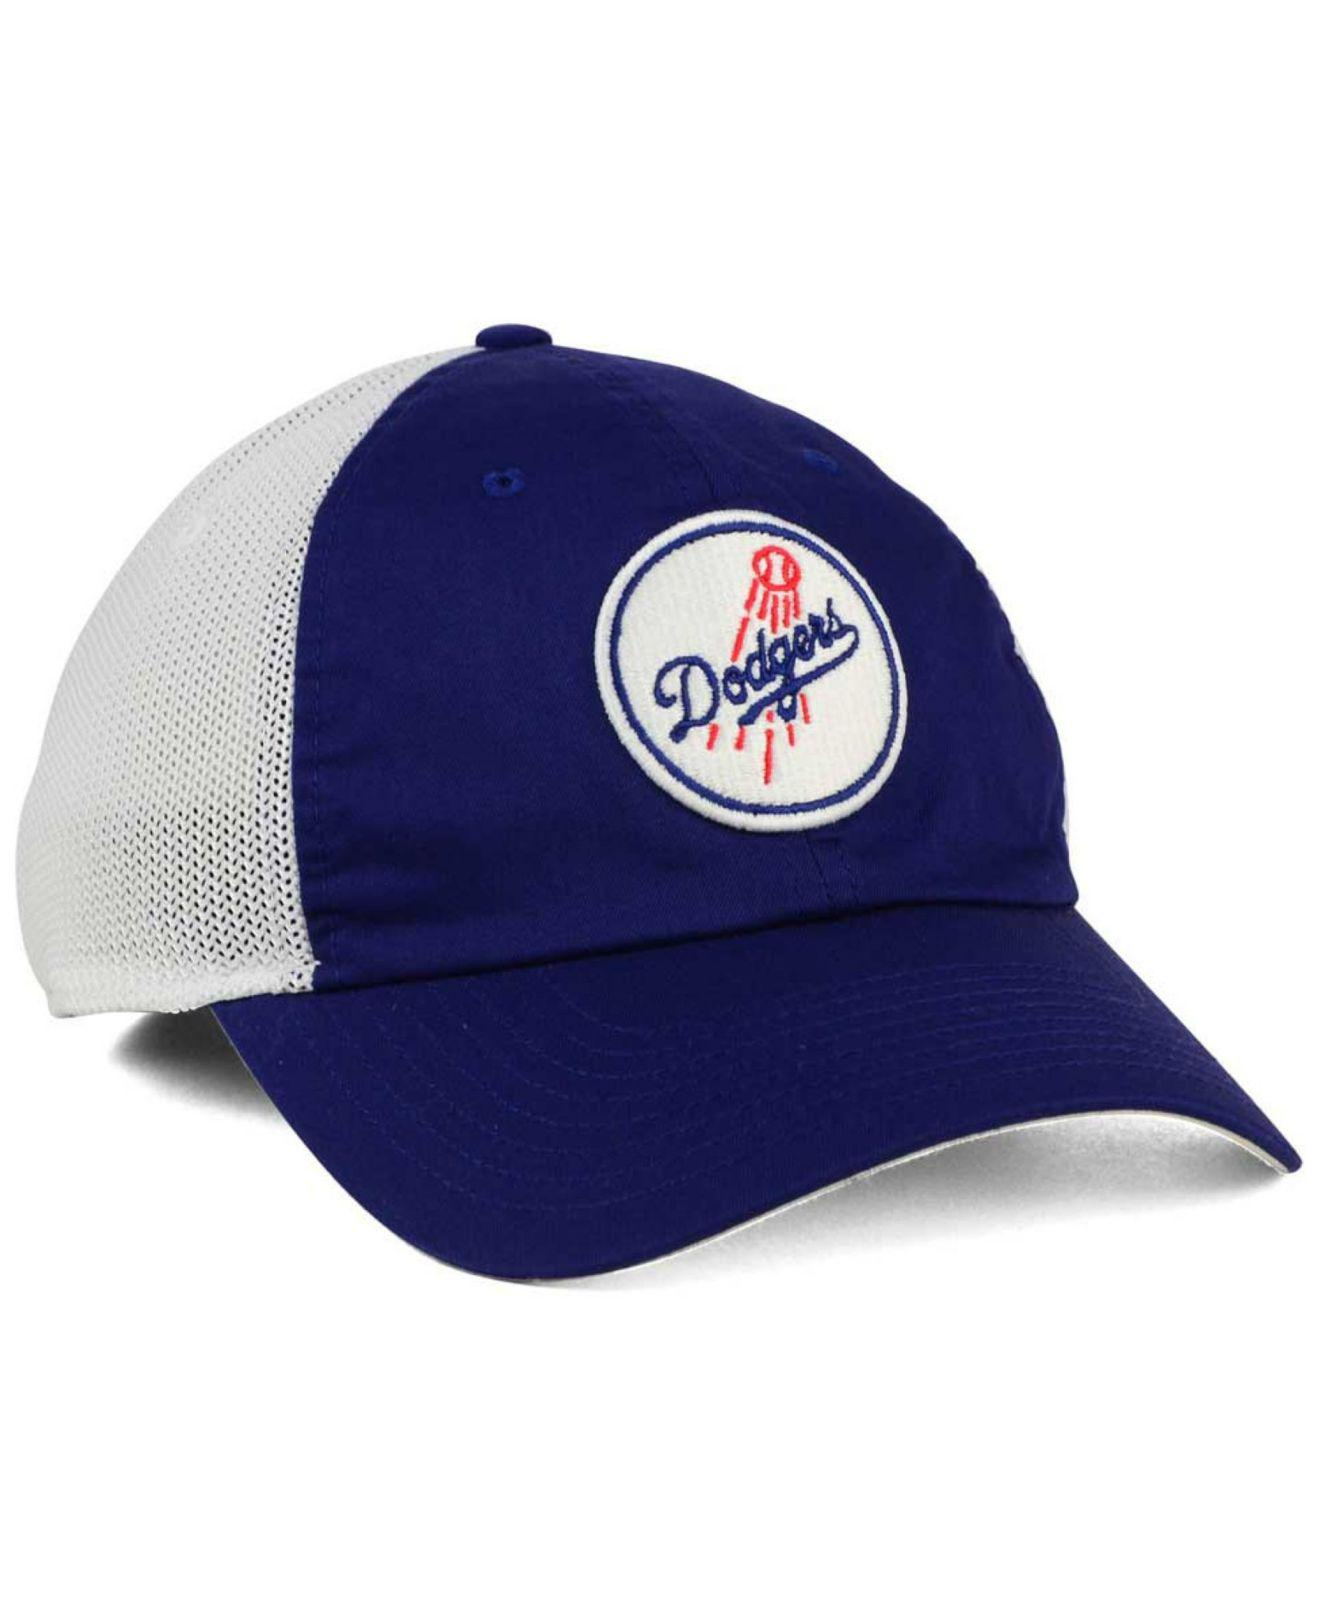 brand new 986a2 ed3f3 Nike - Blue Los Angeles Dodgers Dri-fit Mesh Swoosh Adjustable Cap for Men  -. View fullscreen